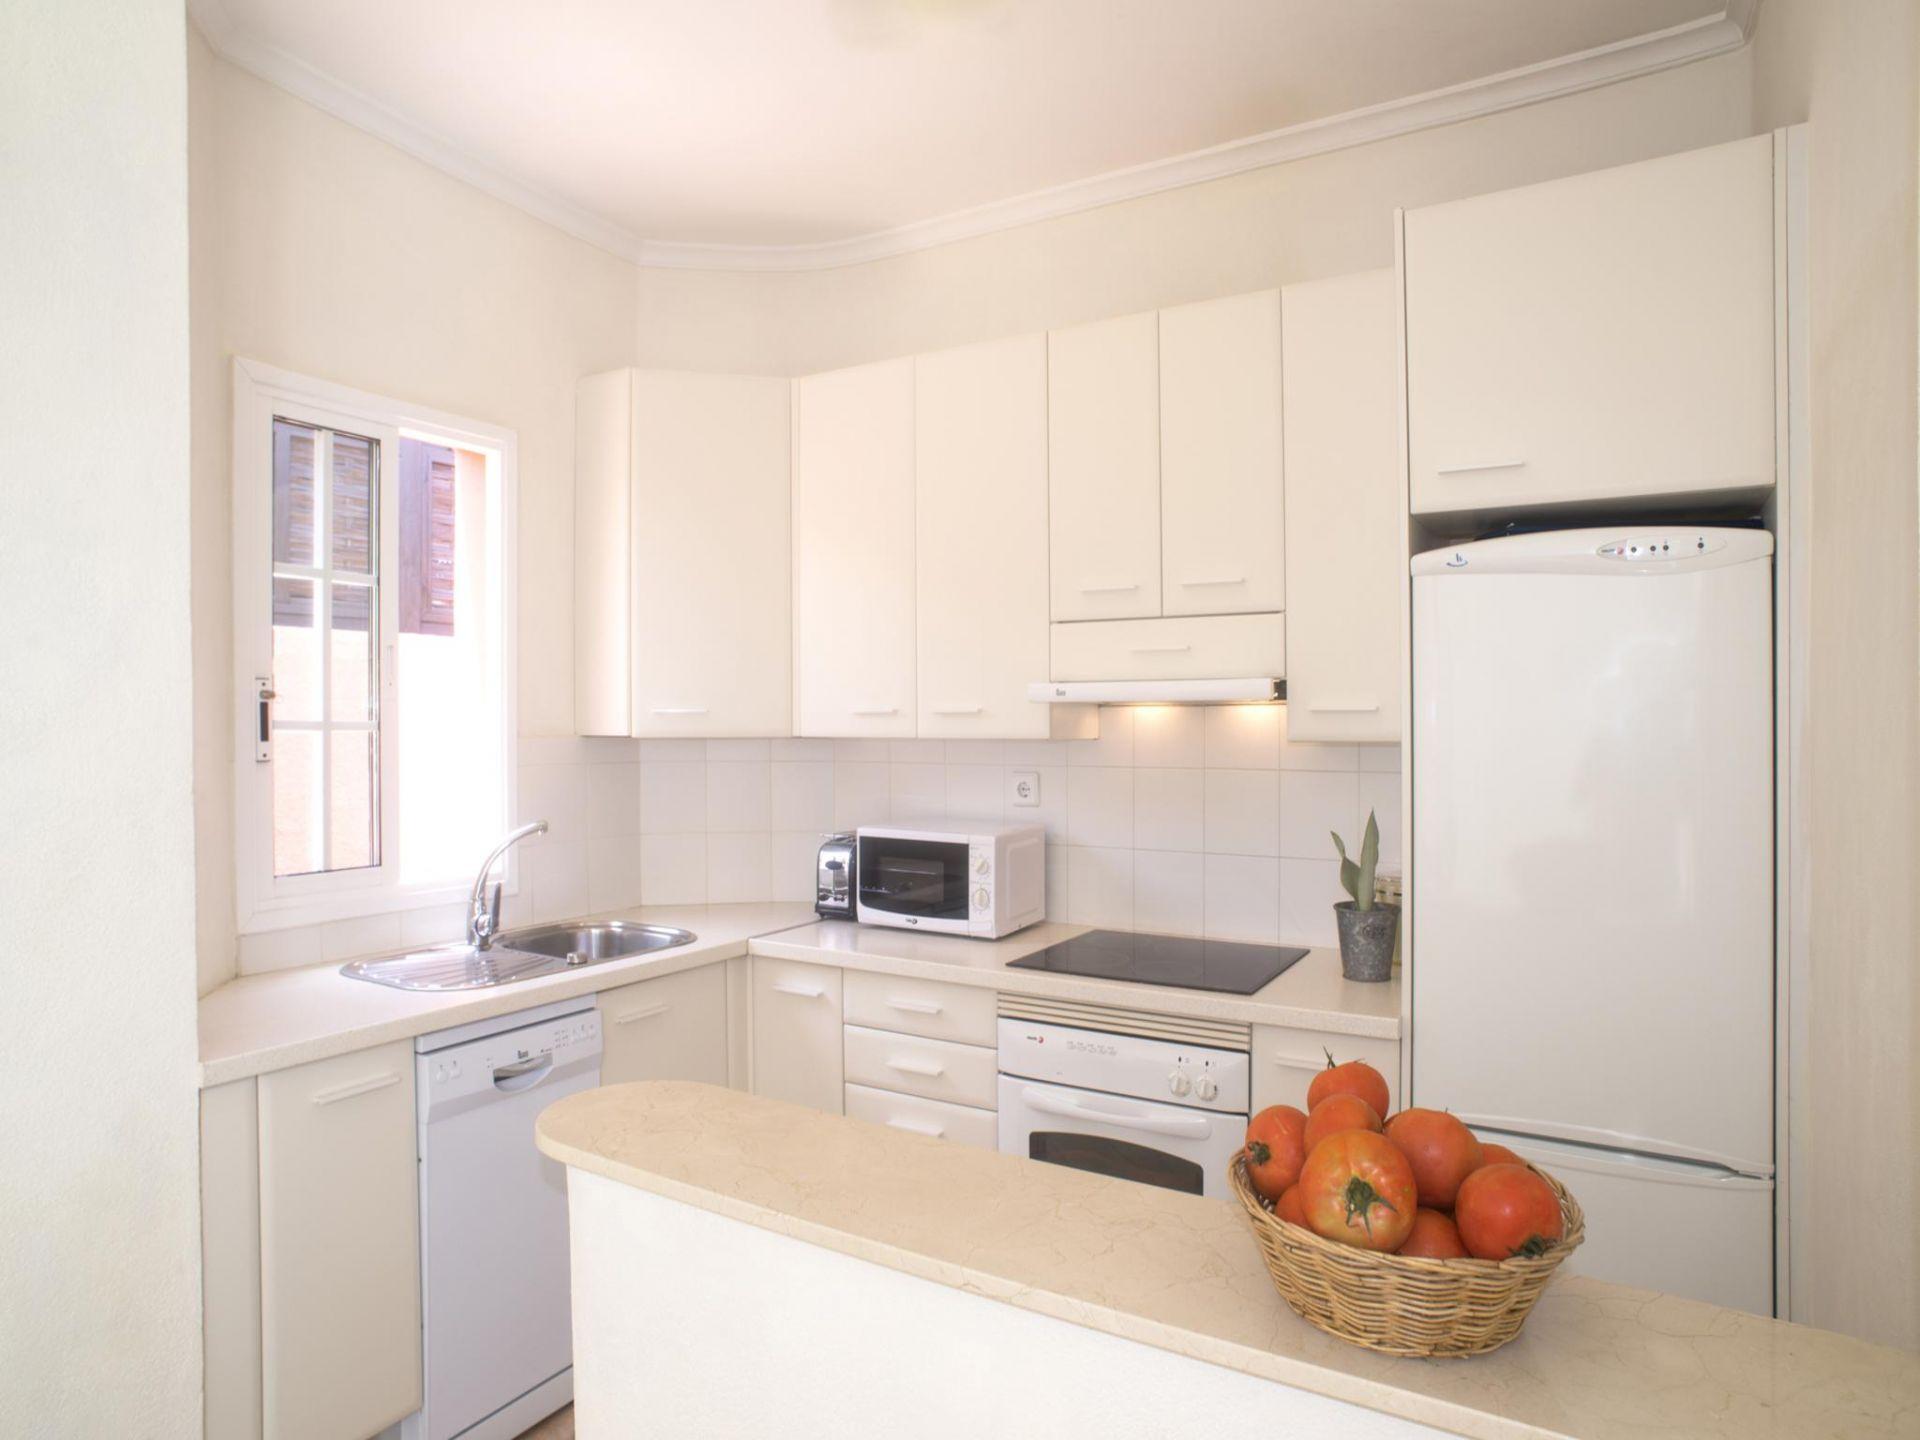 Holiday apartment Villa San Agustin 10 - Holiday Rental (854295), Maspalomas, Gran Canaria, Canary Islands, Spain, picture 16